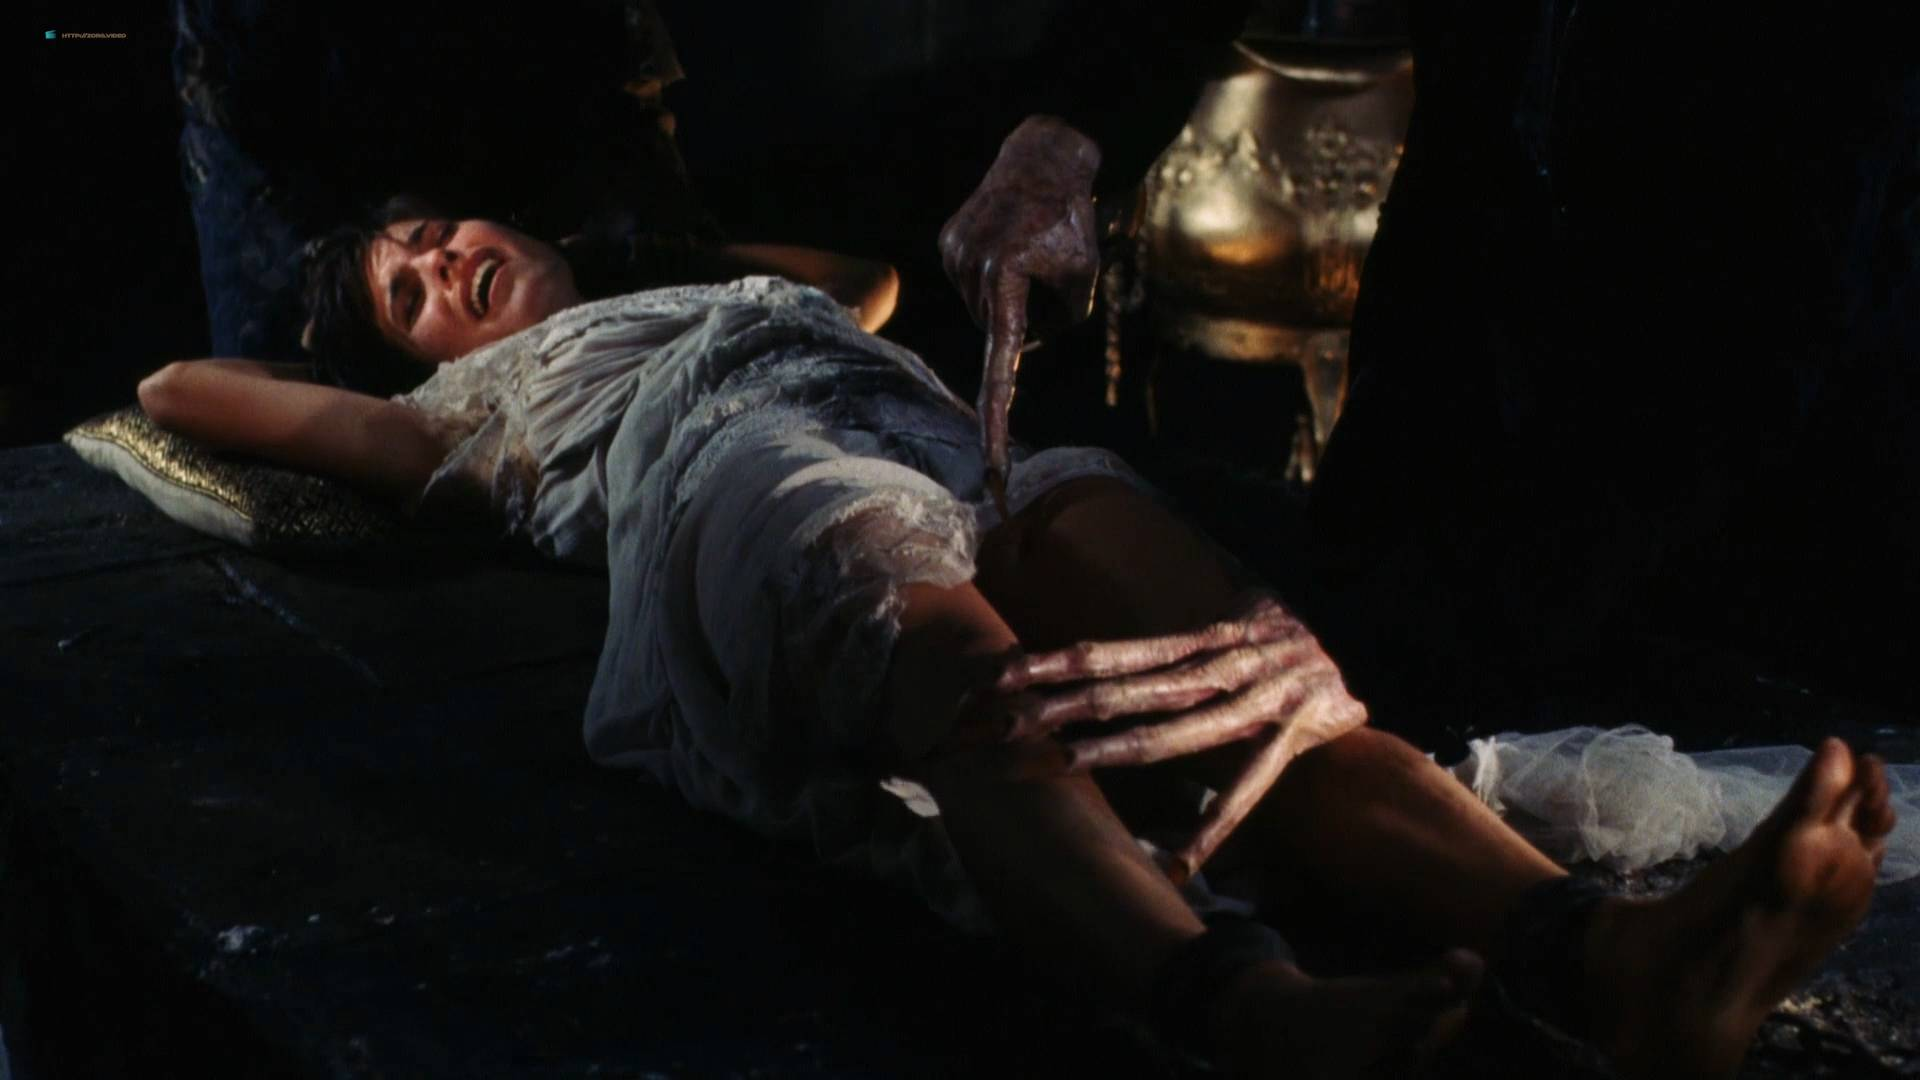 Denice Duff nude bush in the shower Melanie Shatner nude boobs - Bloodstone: Subspecies II (1993) HD 1080p BluRay (2)